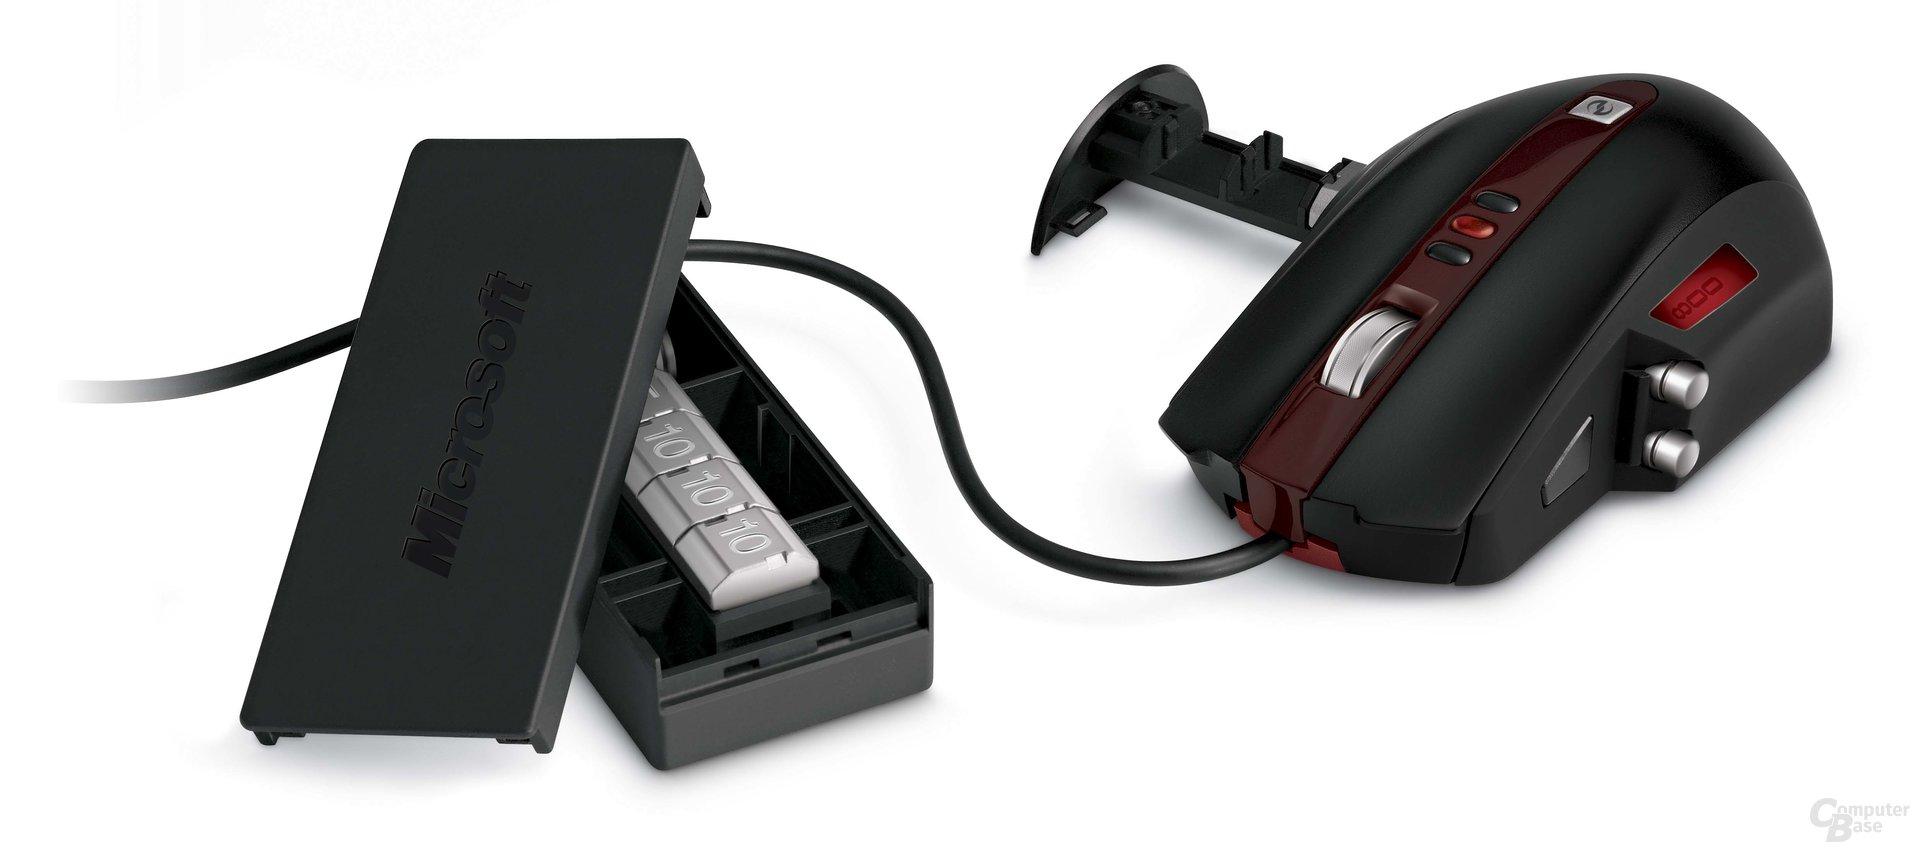 Microsoft SideWinder Mouse